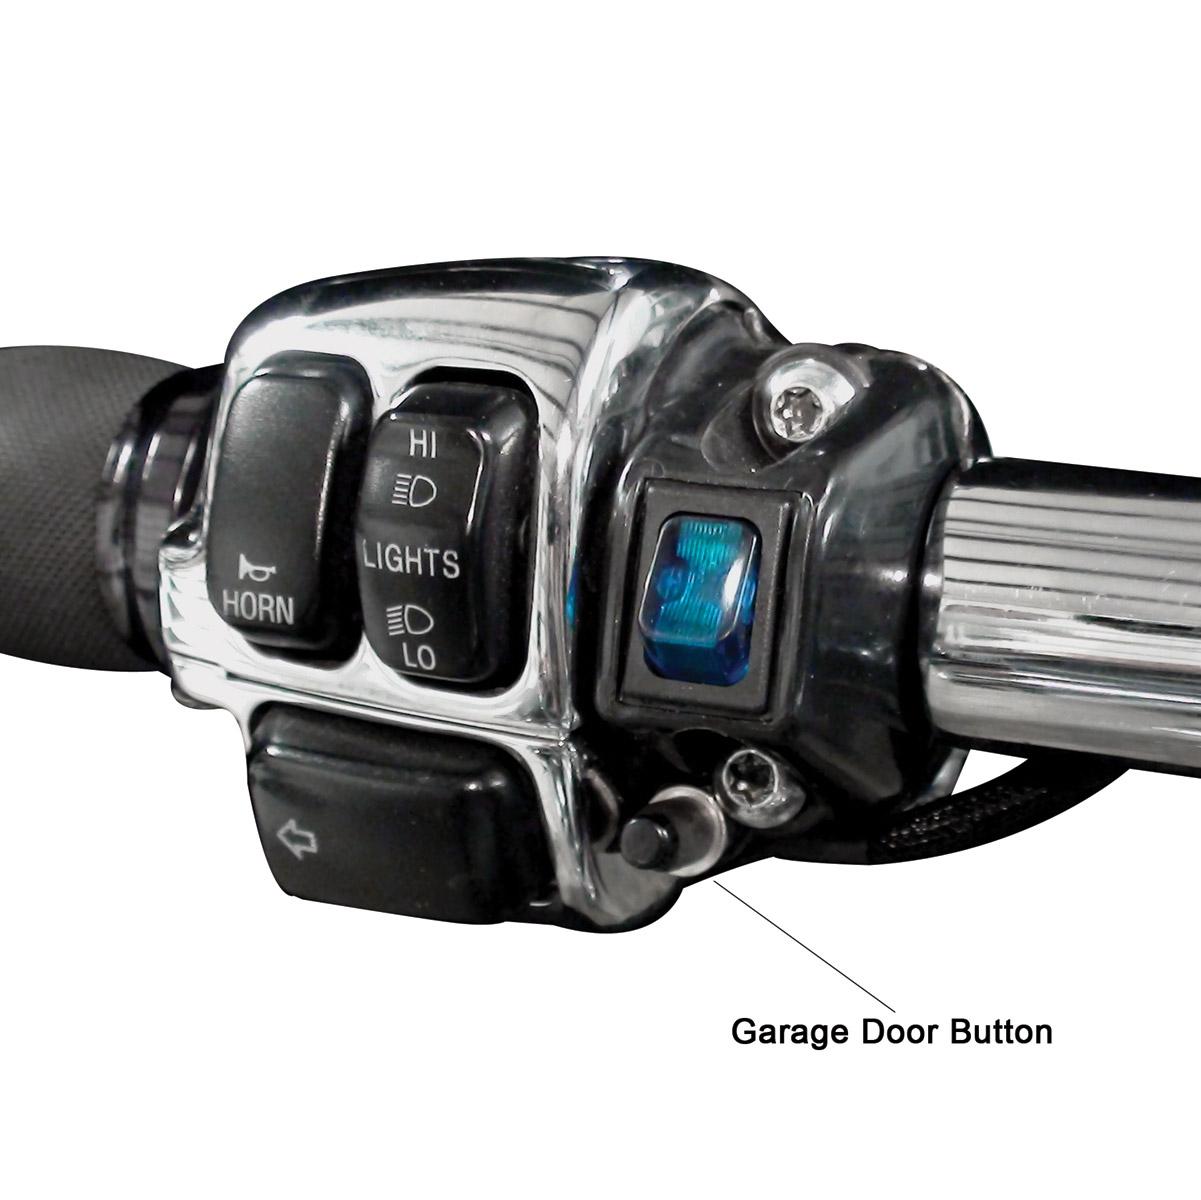 Grip Switch Push Botton Garage Door Opener With Additional